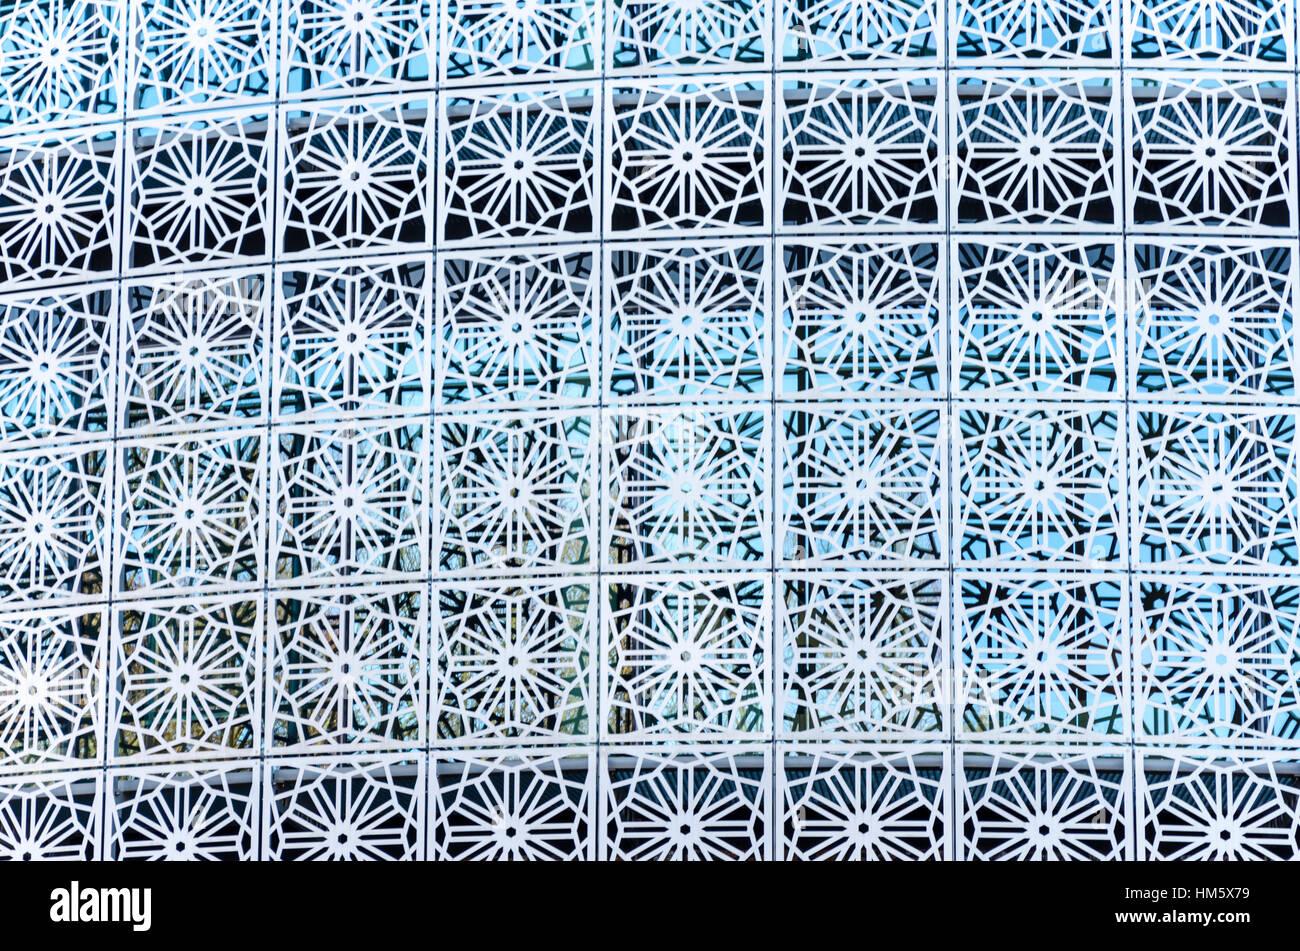 Design detail at the Embassy of the Kingdom of Saudi Arabia in Germany, Tiergartenstrasse, Berlin, Germany - Stock Image